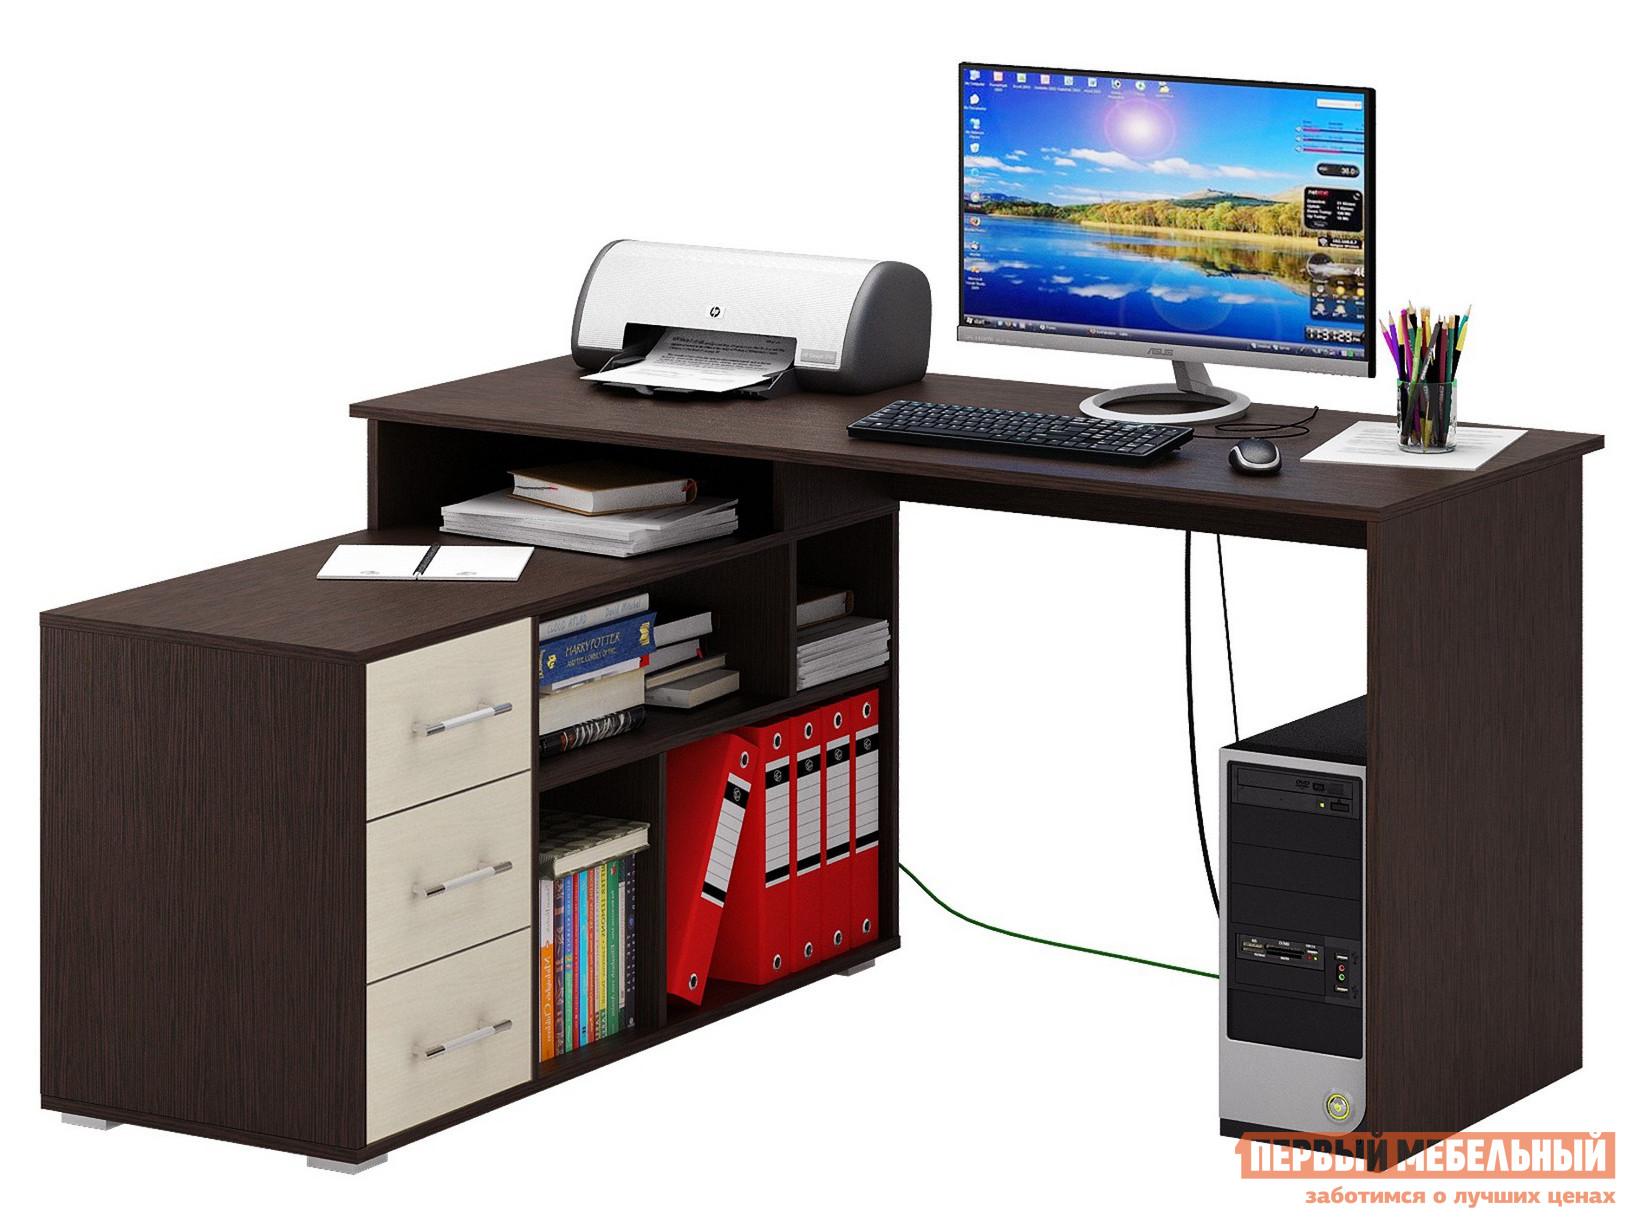 Компьютерный стол МФ Мастер Барди-2 угловой